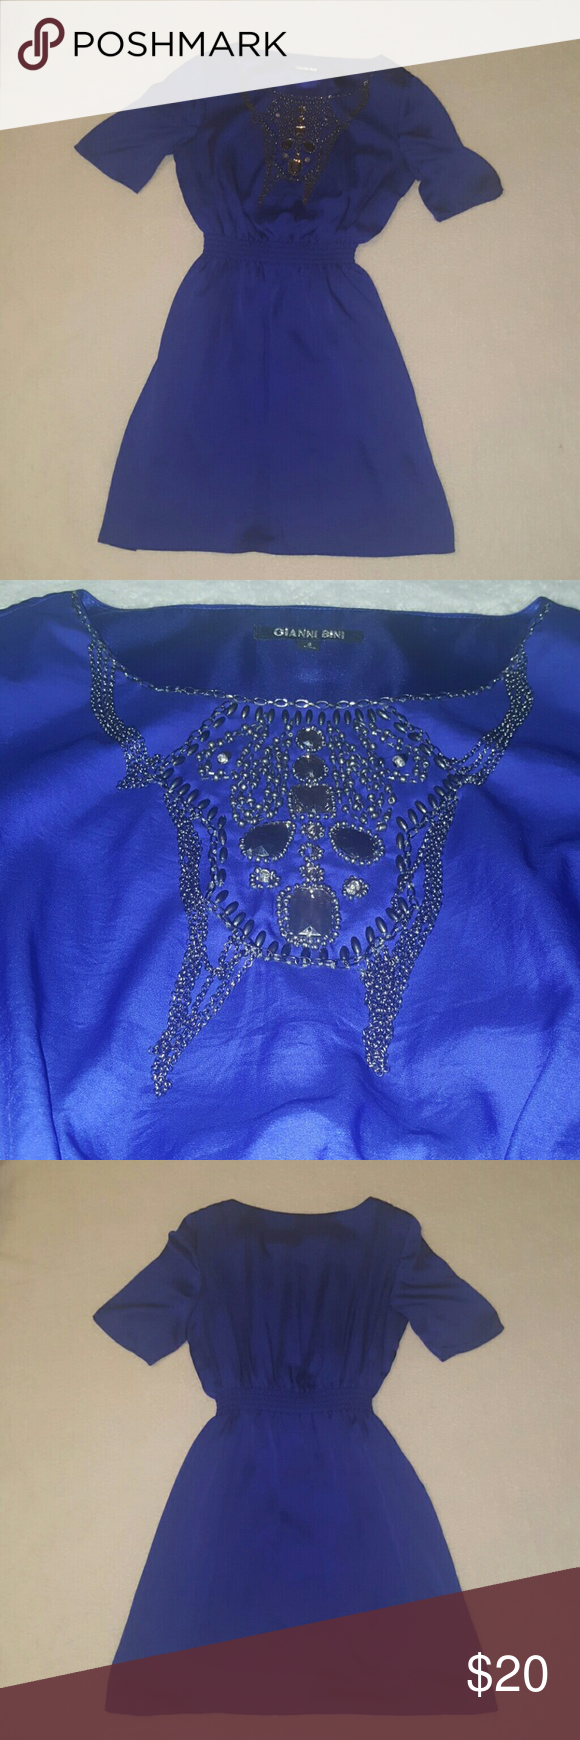 Embellished Navy blue Gianni Bini dress. Worn once. Fits true to size. Gianni Bini Dresses Midi